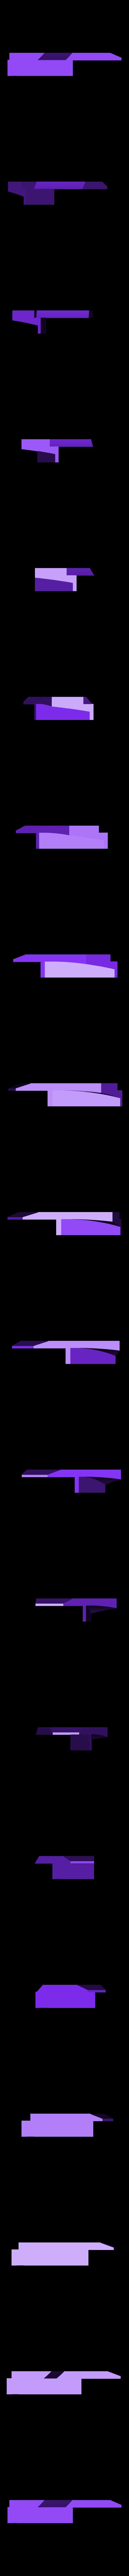 green side left.stl Download free STL file 1991 Mazda 787B 3d Printed RC Car • 3D printable template, brett